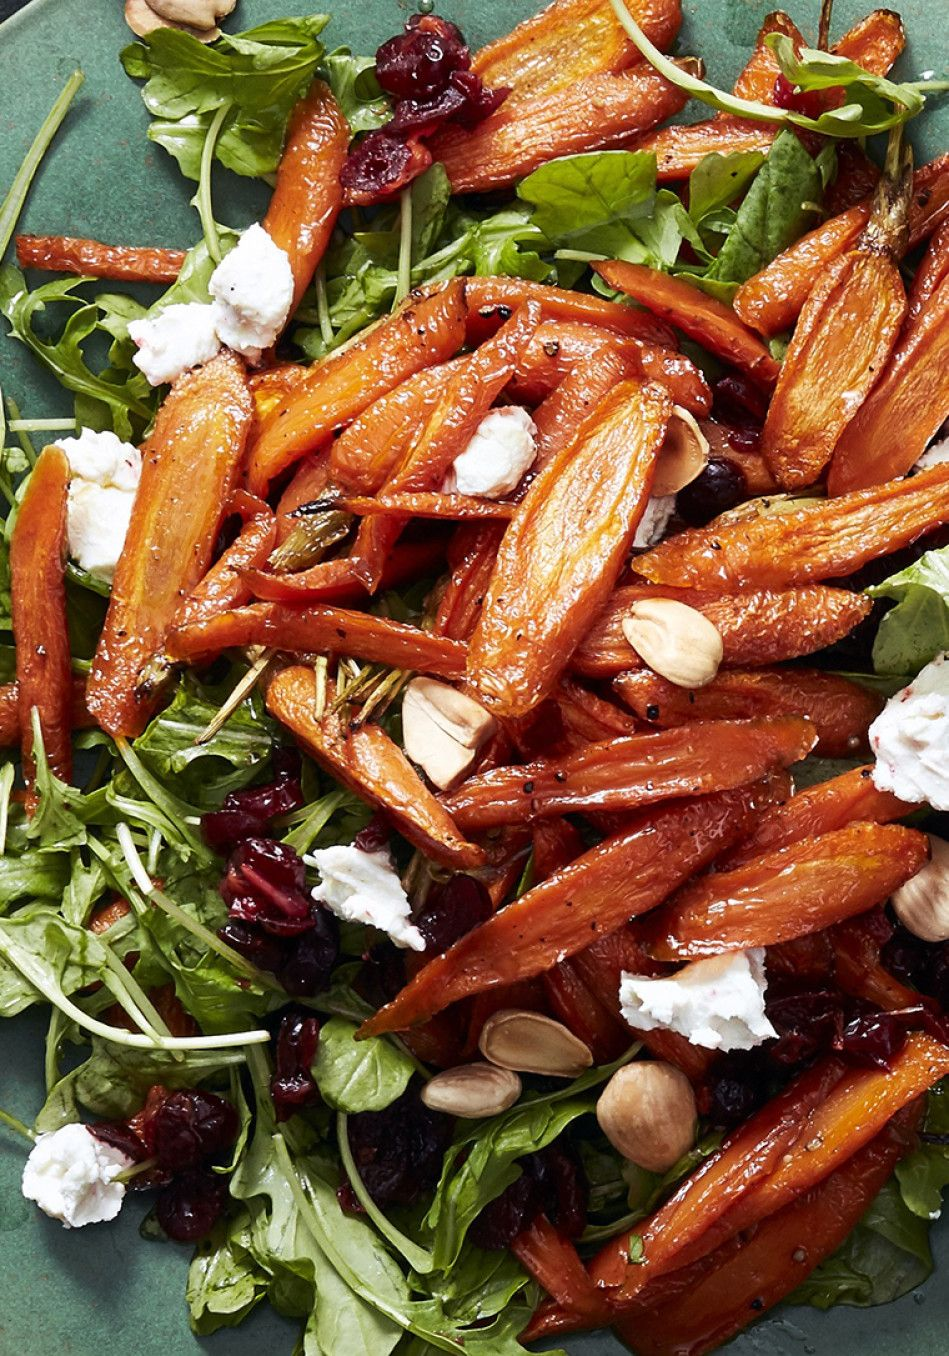 Ina Garten's Maple-Roasted Carrot Salad Recipe #thanksgivingrecipes